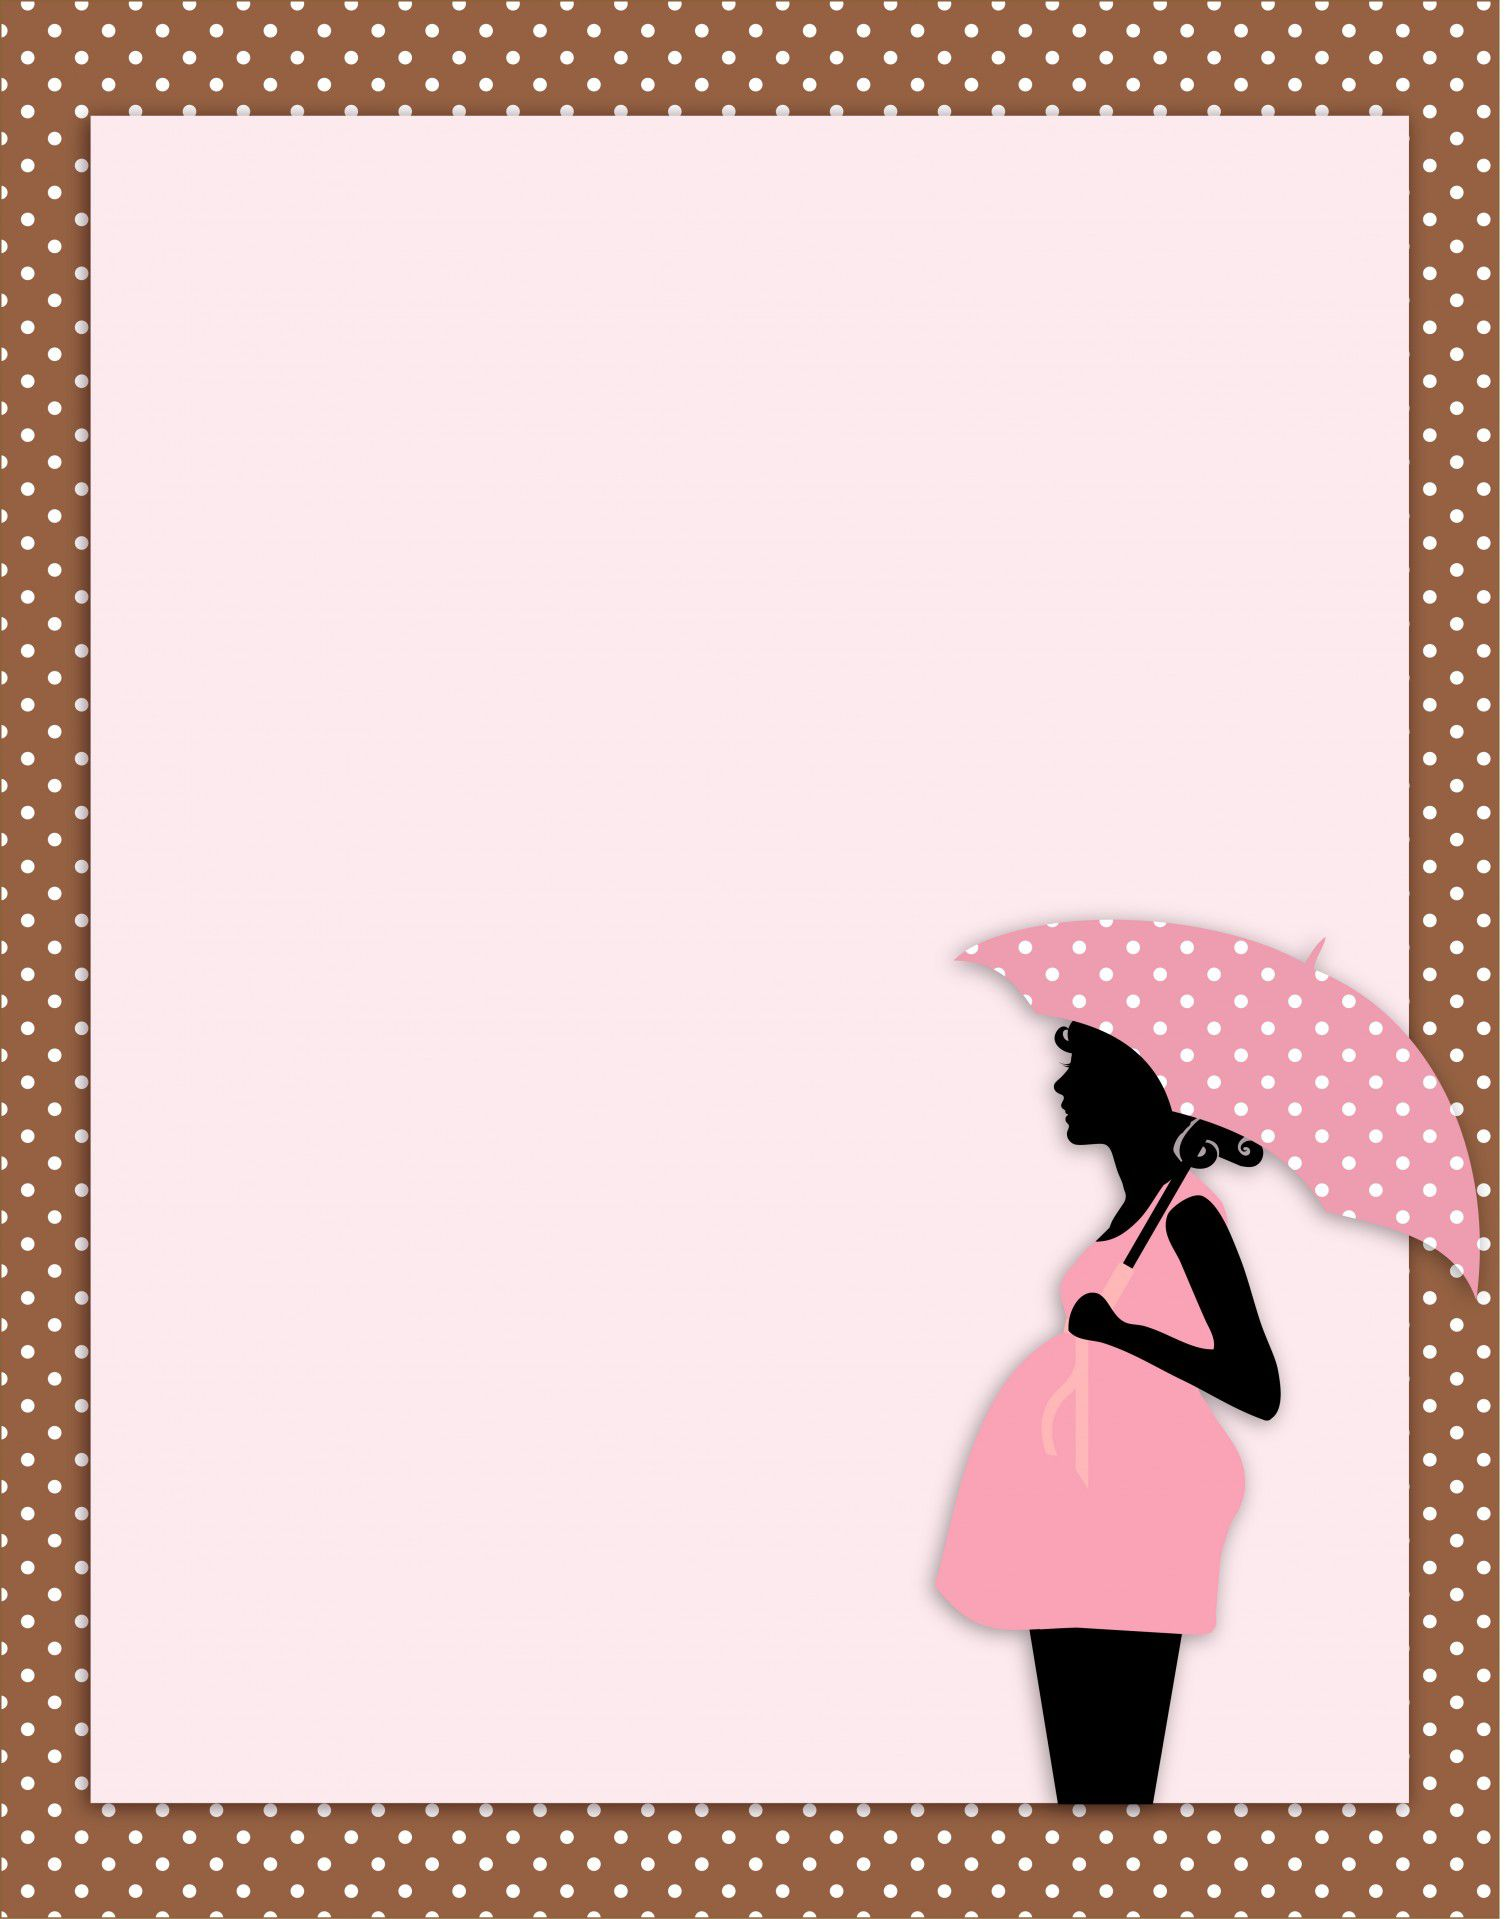 006 Surprising Baby Shower Card Template Photo  Microsoft Word Invitation Design Online Printable FreeFull